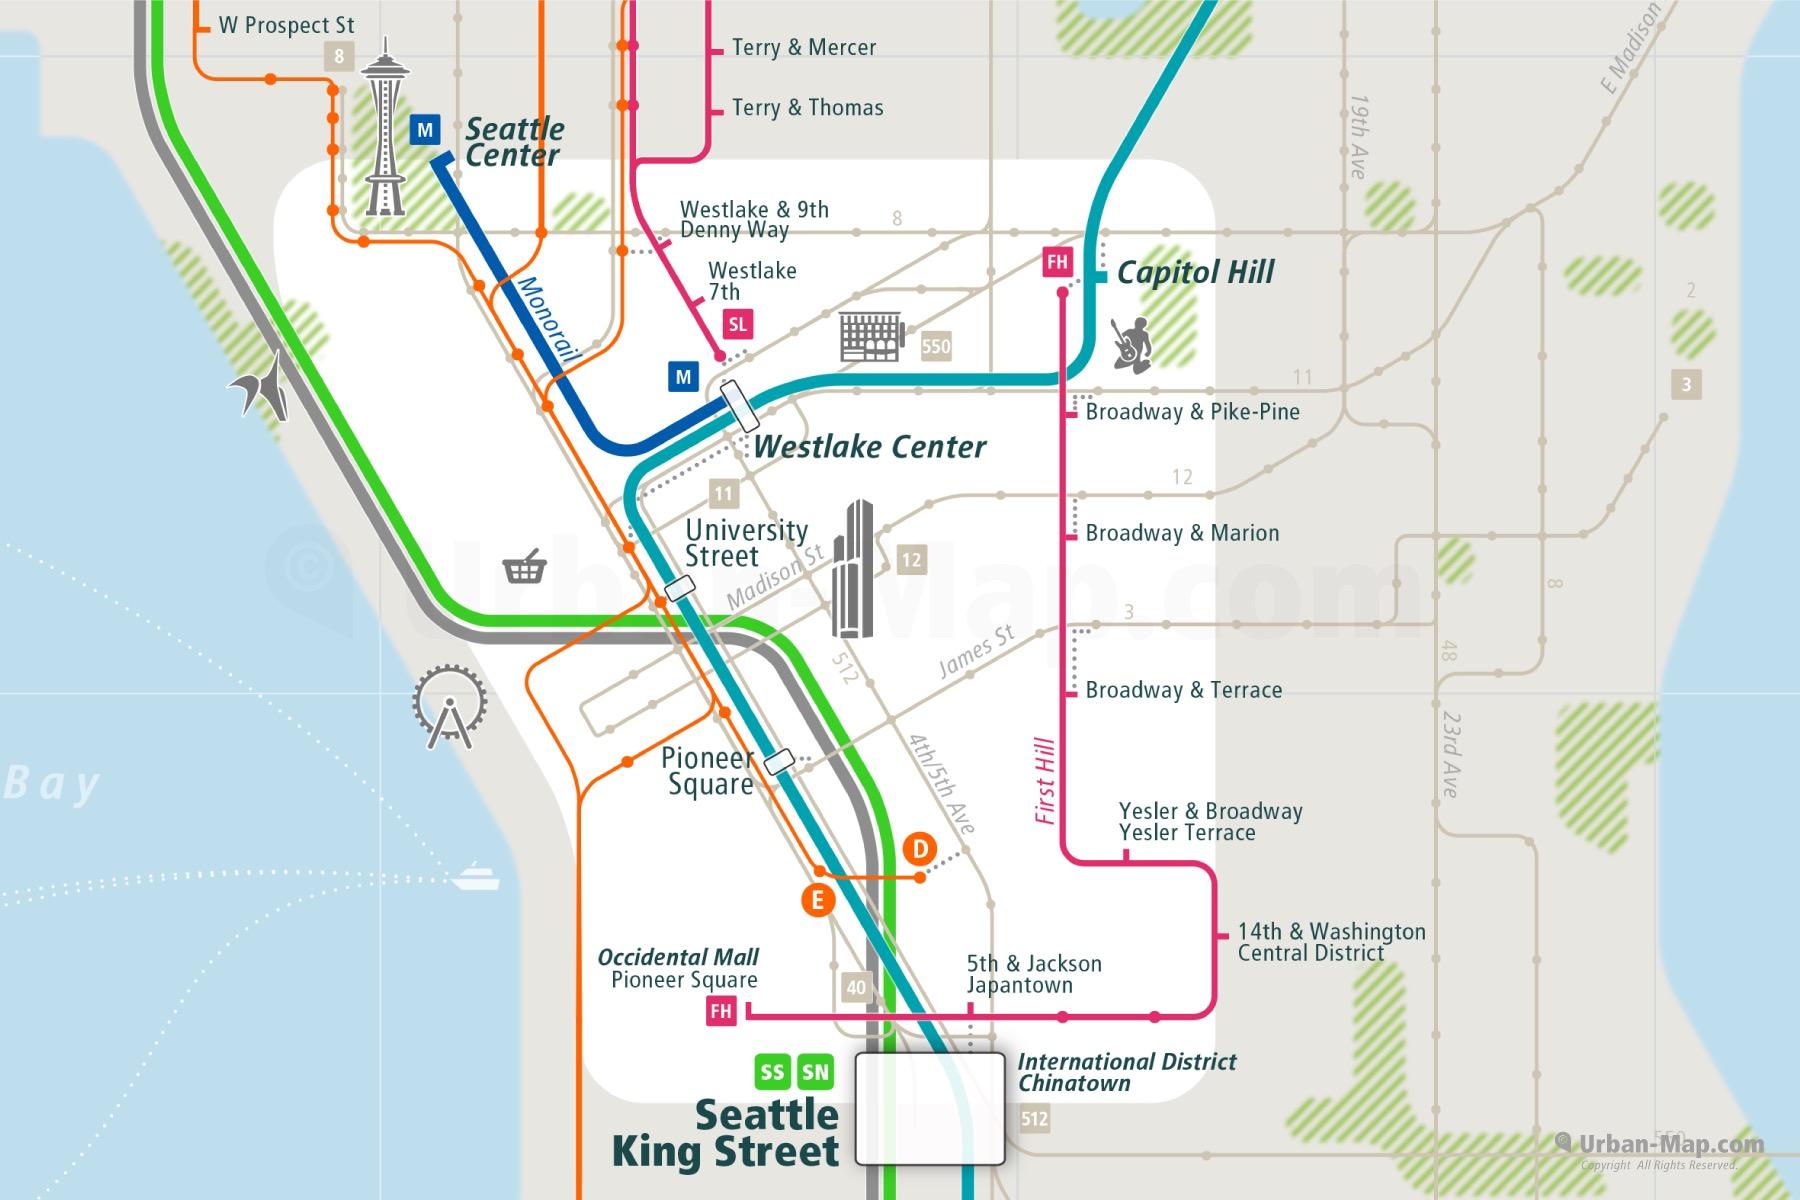 Seattle City Rail Map shows the train and public transportation routes of RapidRide BTR bus rapid transit, bus, monorail, commuter train - Close-Up